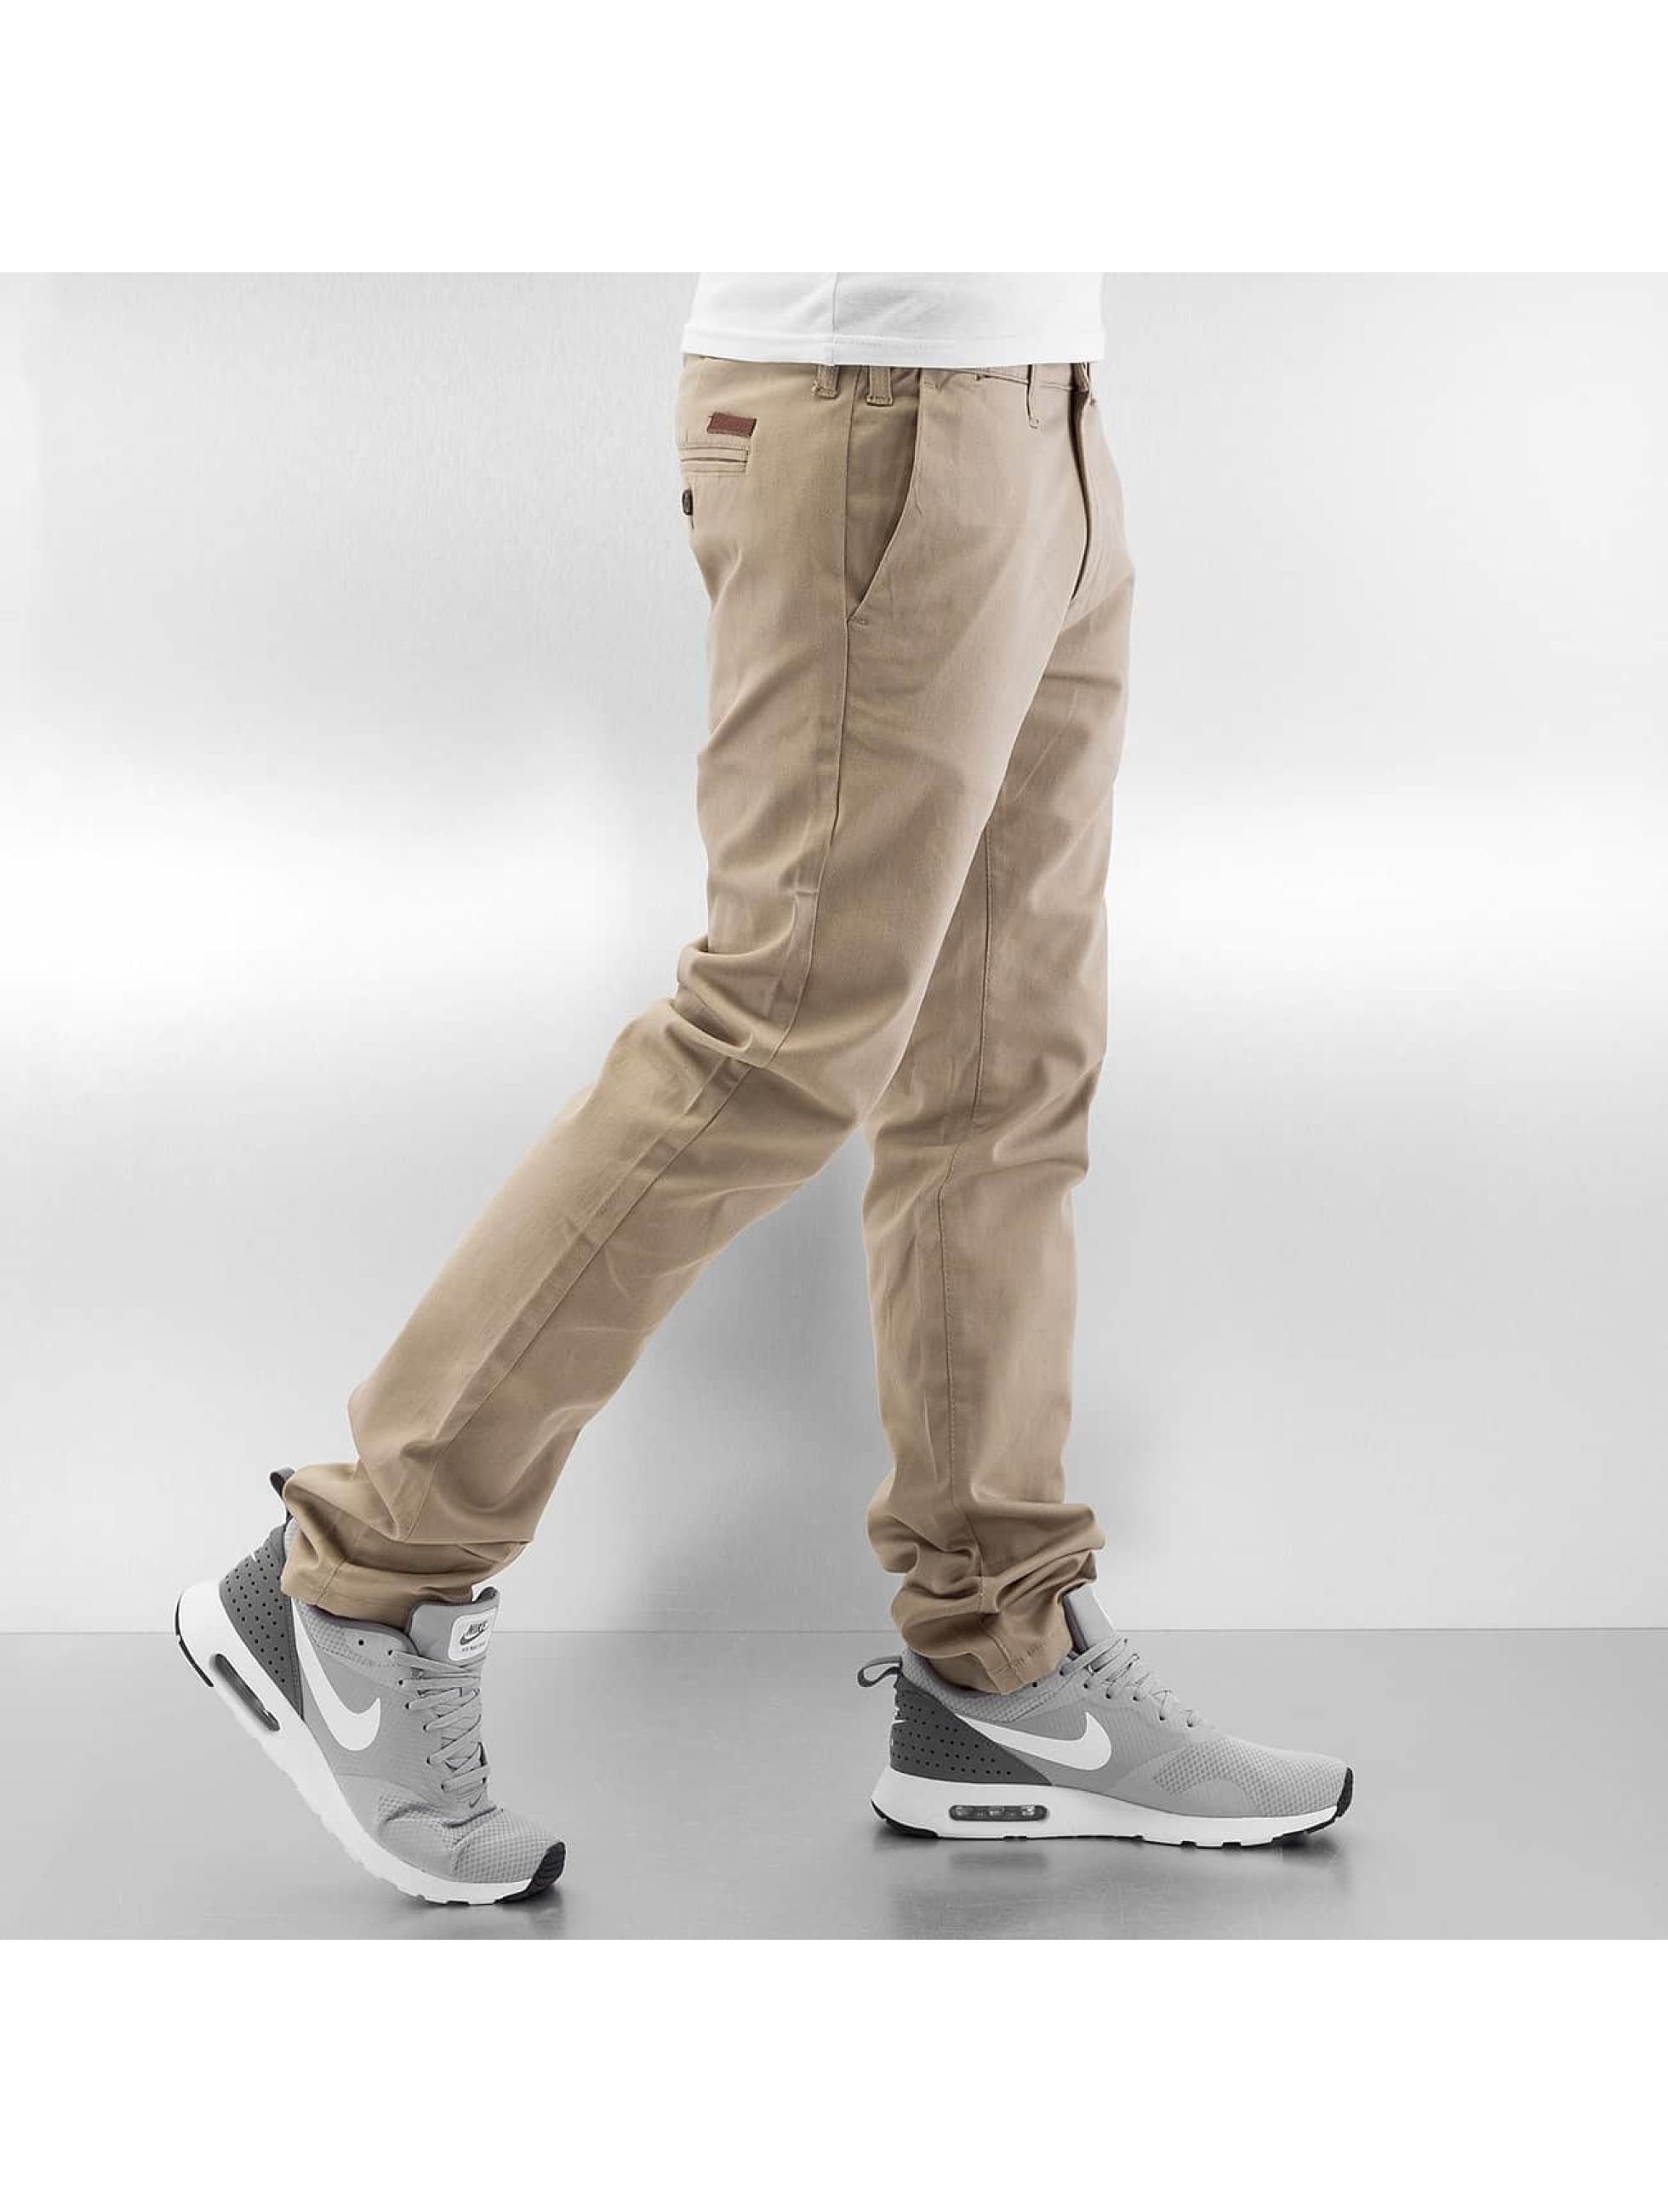 Rocawear Pantalon chino Slim Fit beige